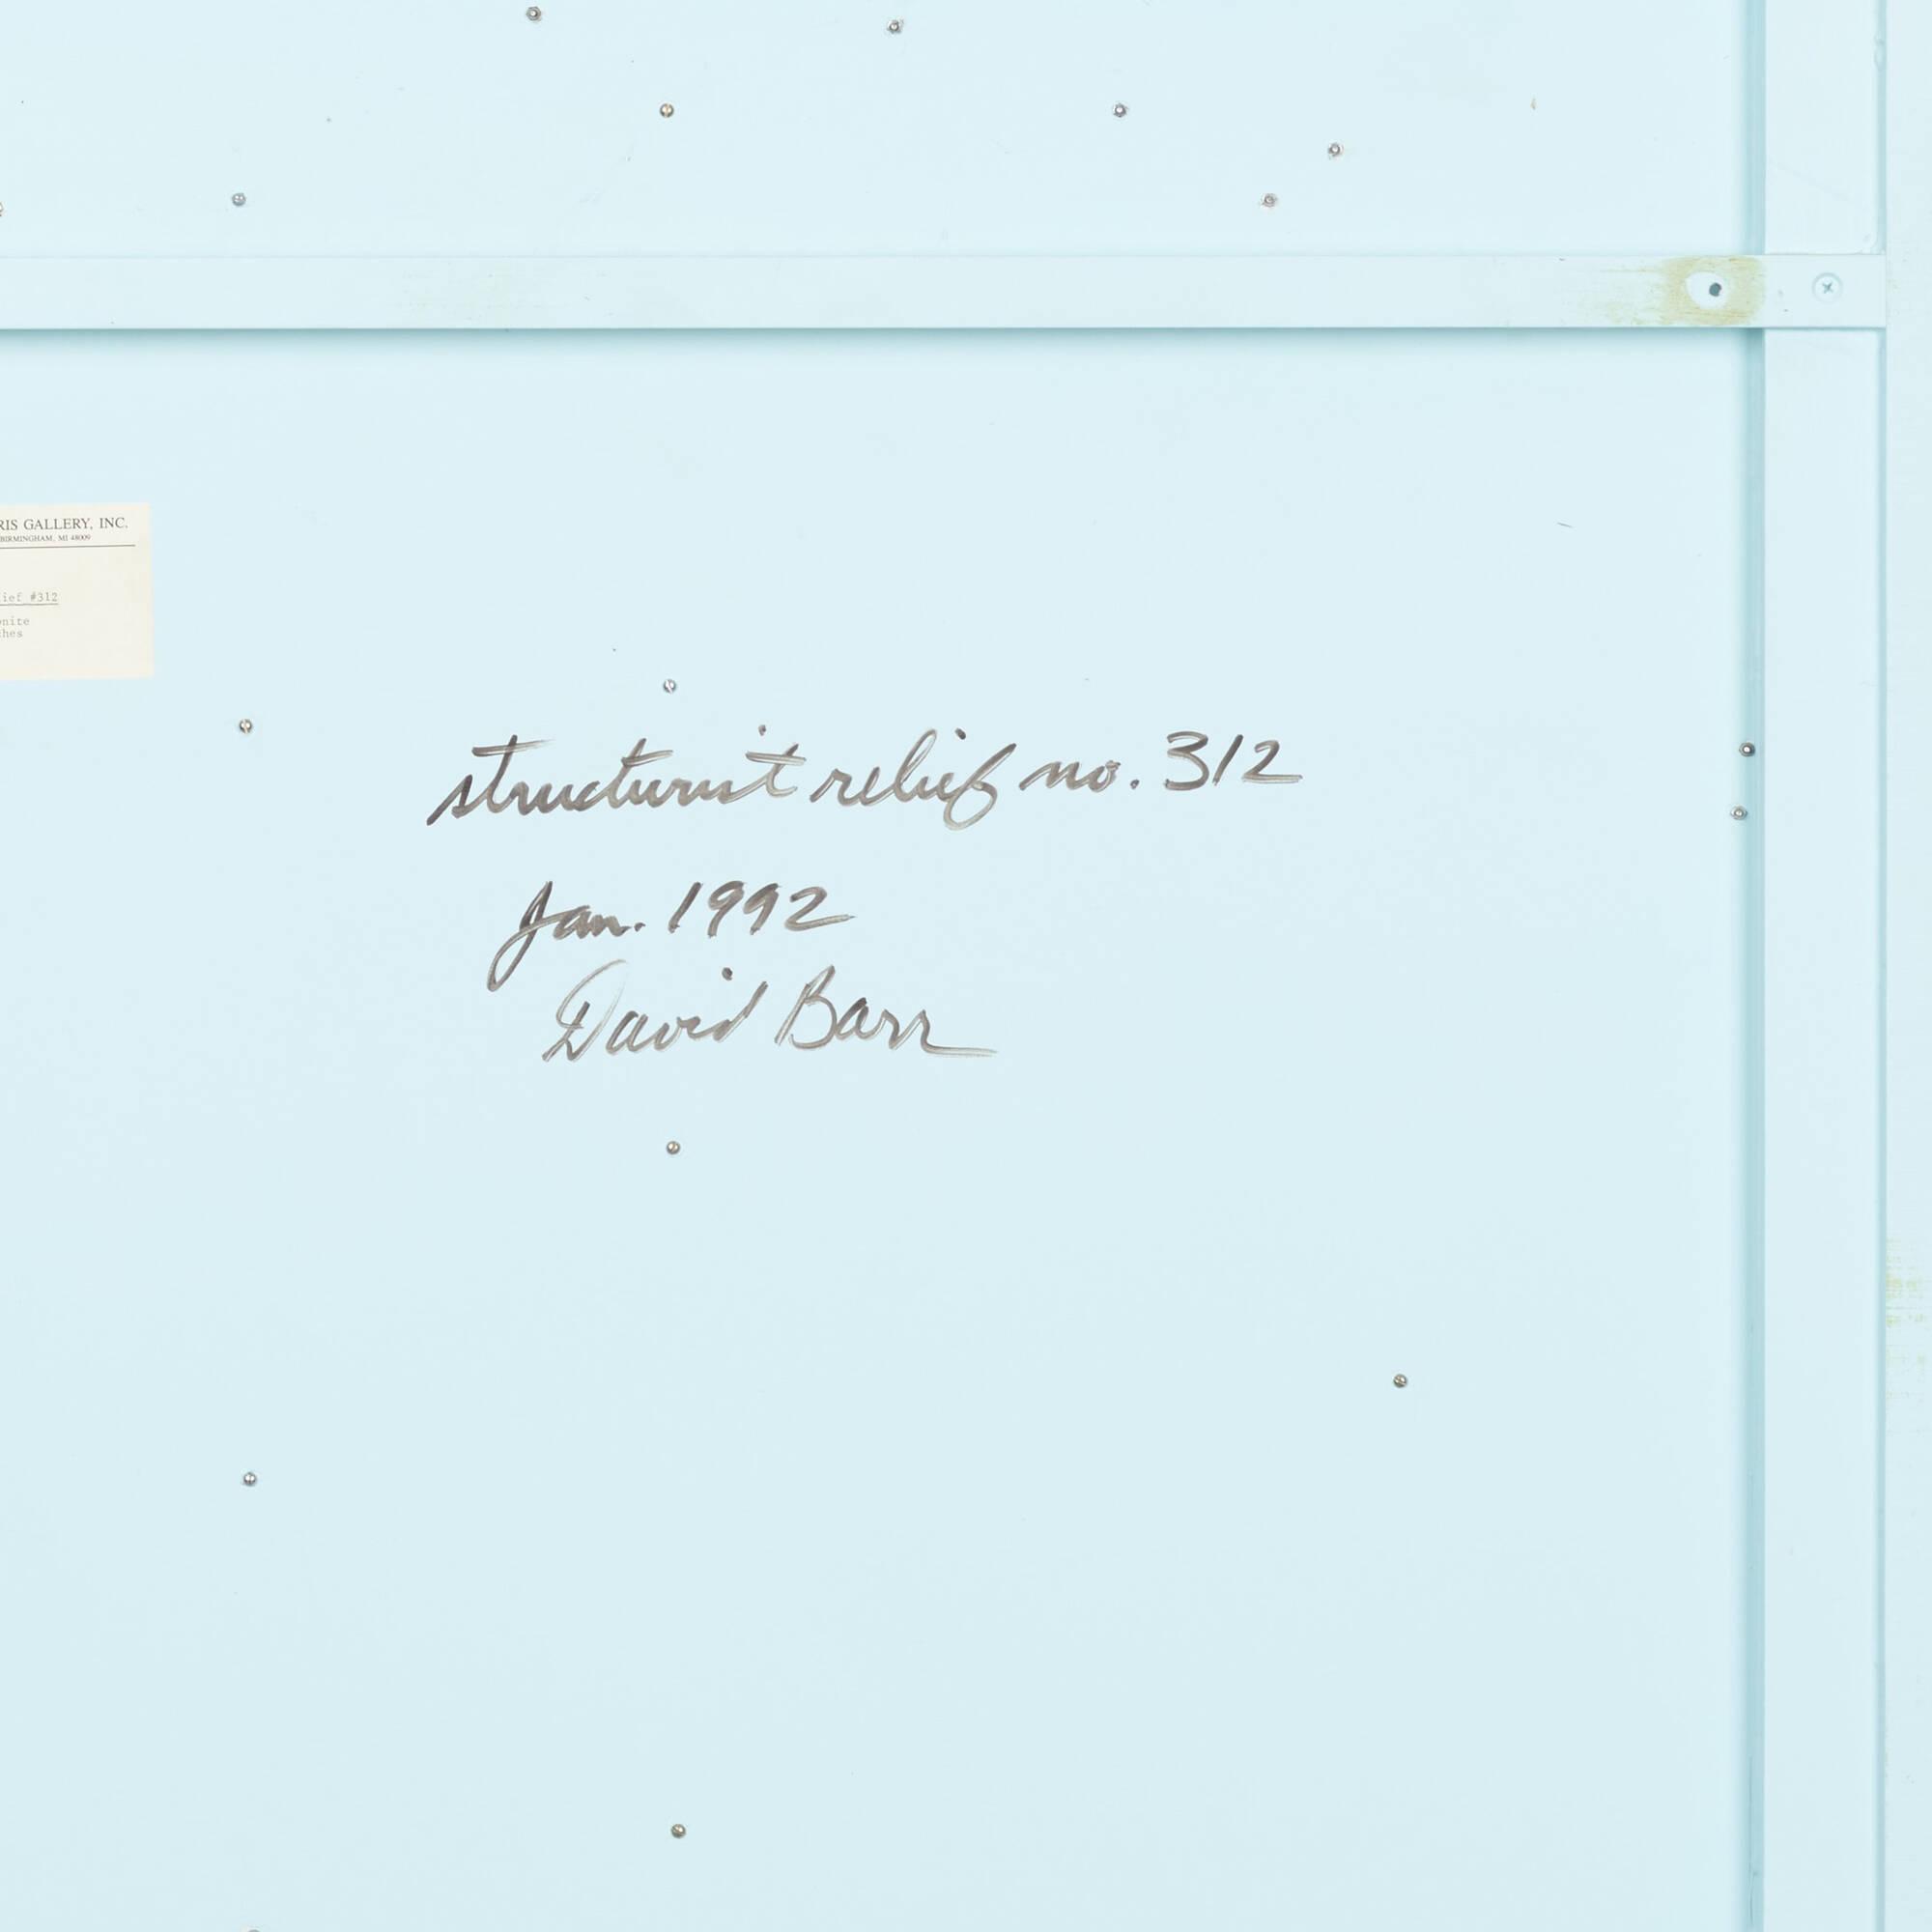 141: David Barr / Structurist Relief No. 312 (4 of 4)